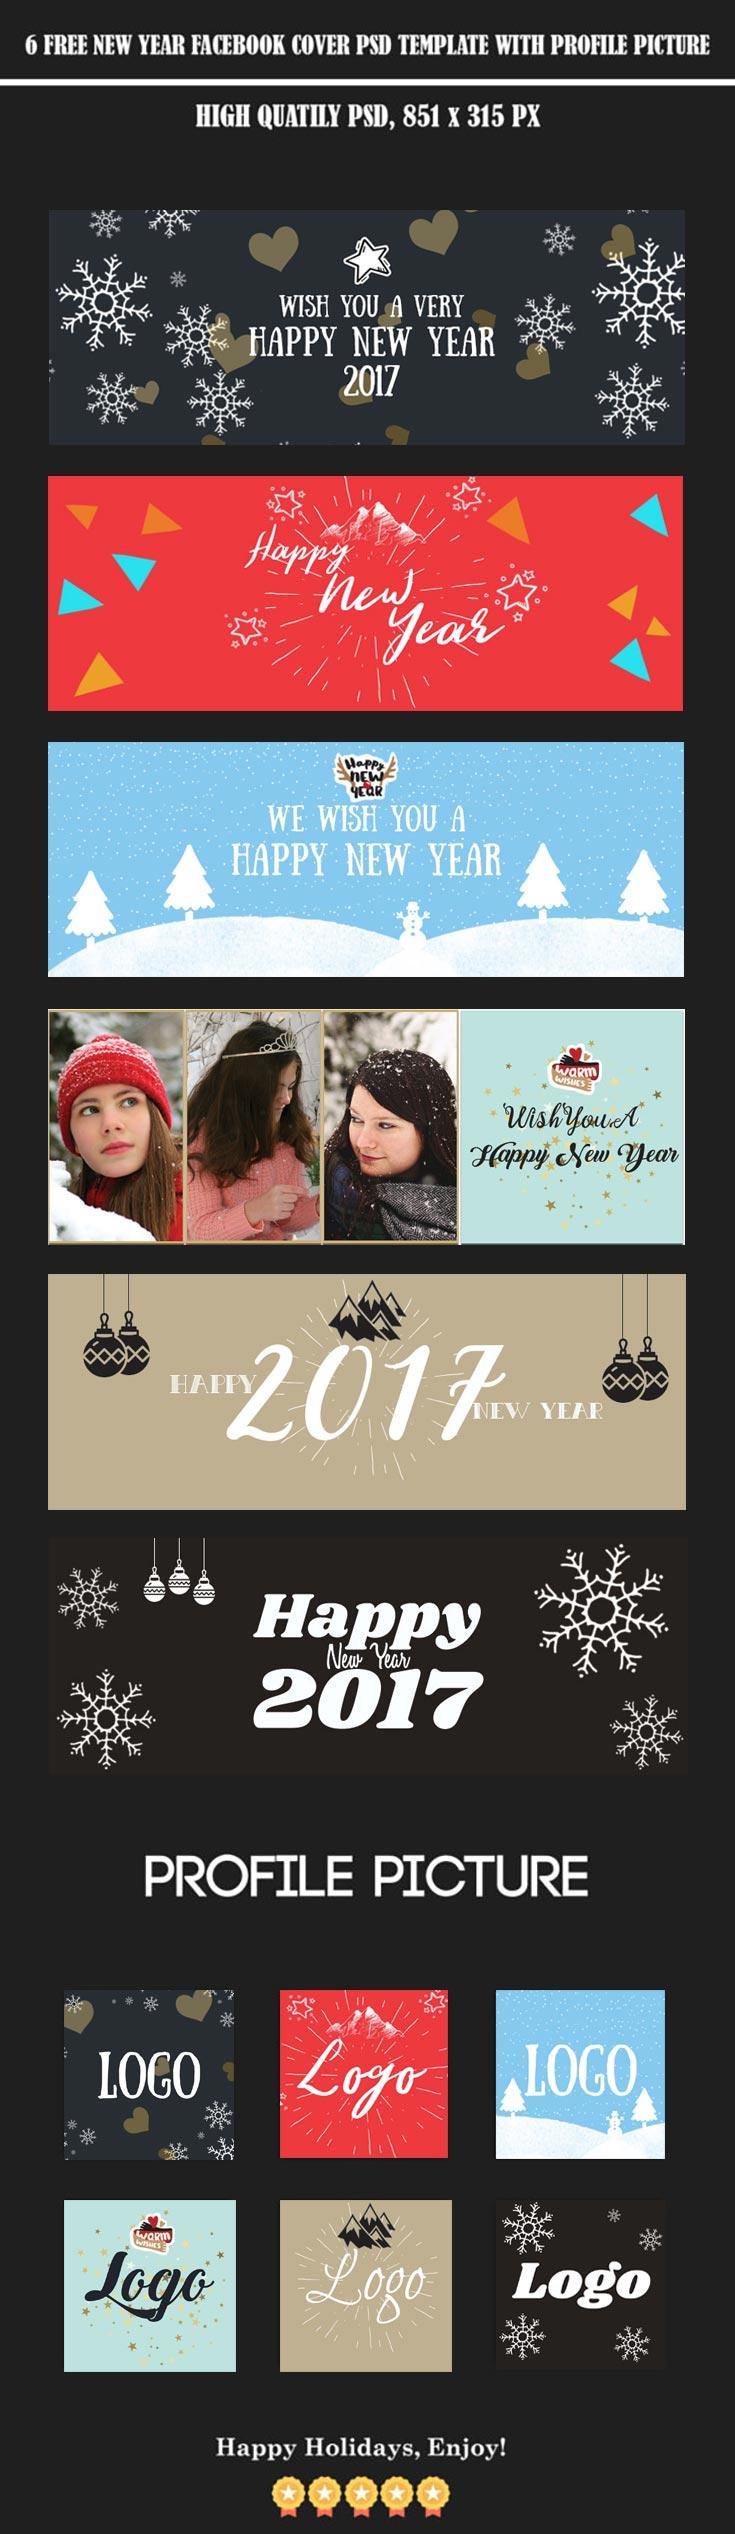 6 Free New Year Facebook Cover Psd Creativetacos